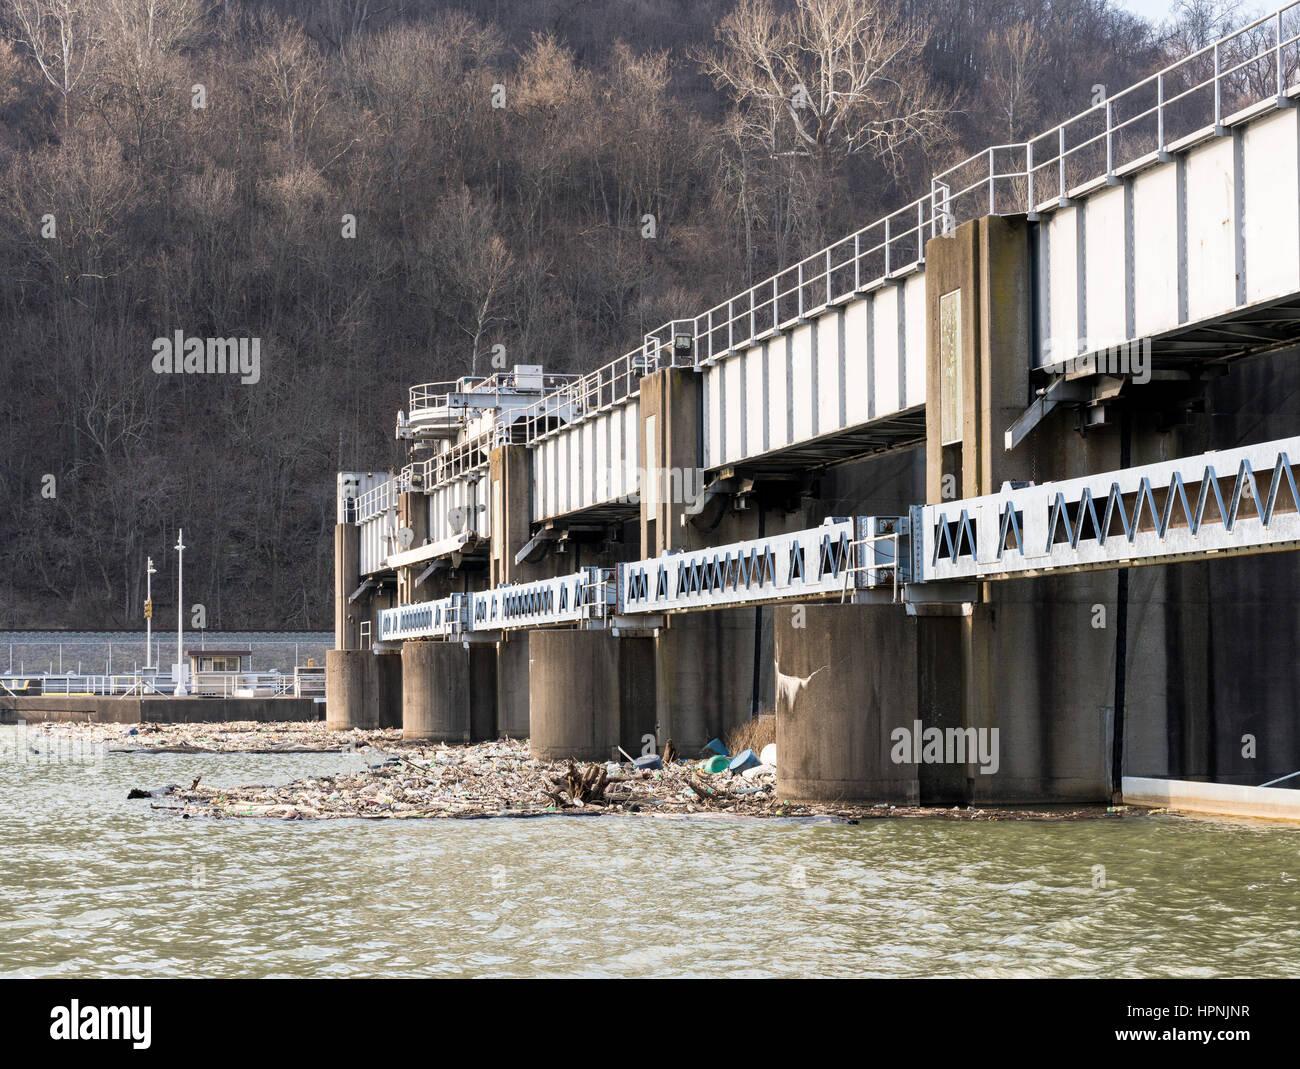 Lock or dam sluice gates on River Monongahela in Morgantown West Virginia with collected trash - Stock Image